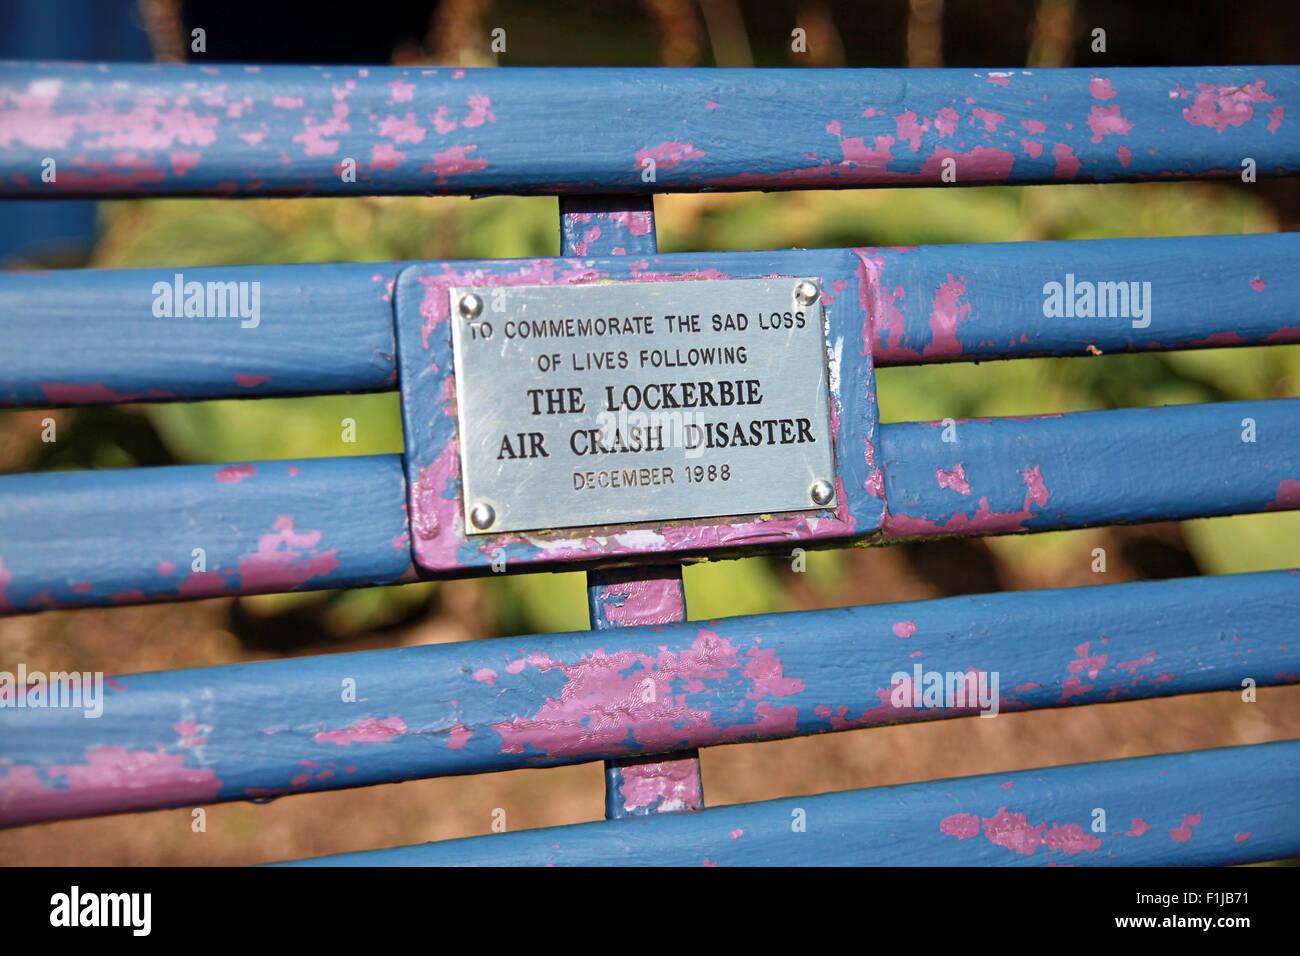 Lockerbie PanAm103 In Rememberance Memorial bench, Scotland - Stock Image